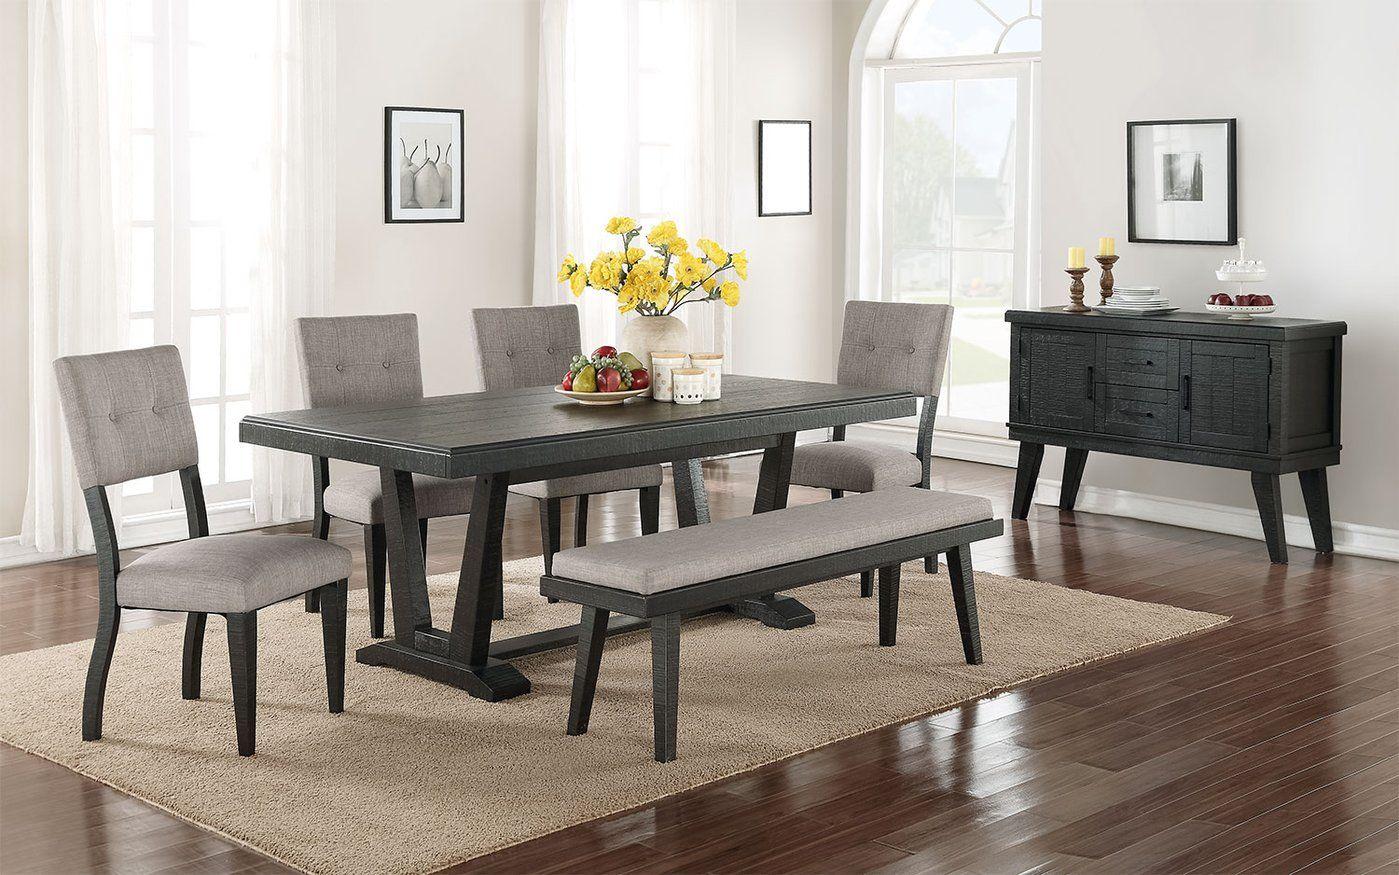 Imari 7 Piece Dining Room Set Black And Grey Cheap Dining Room